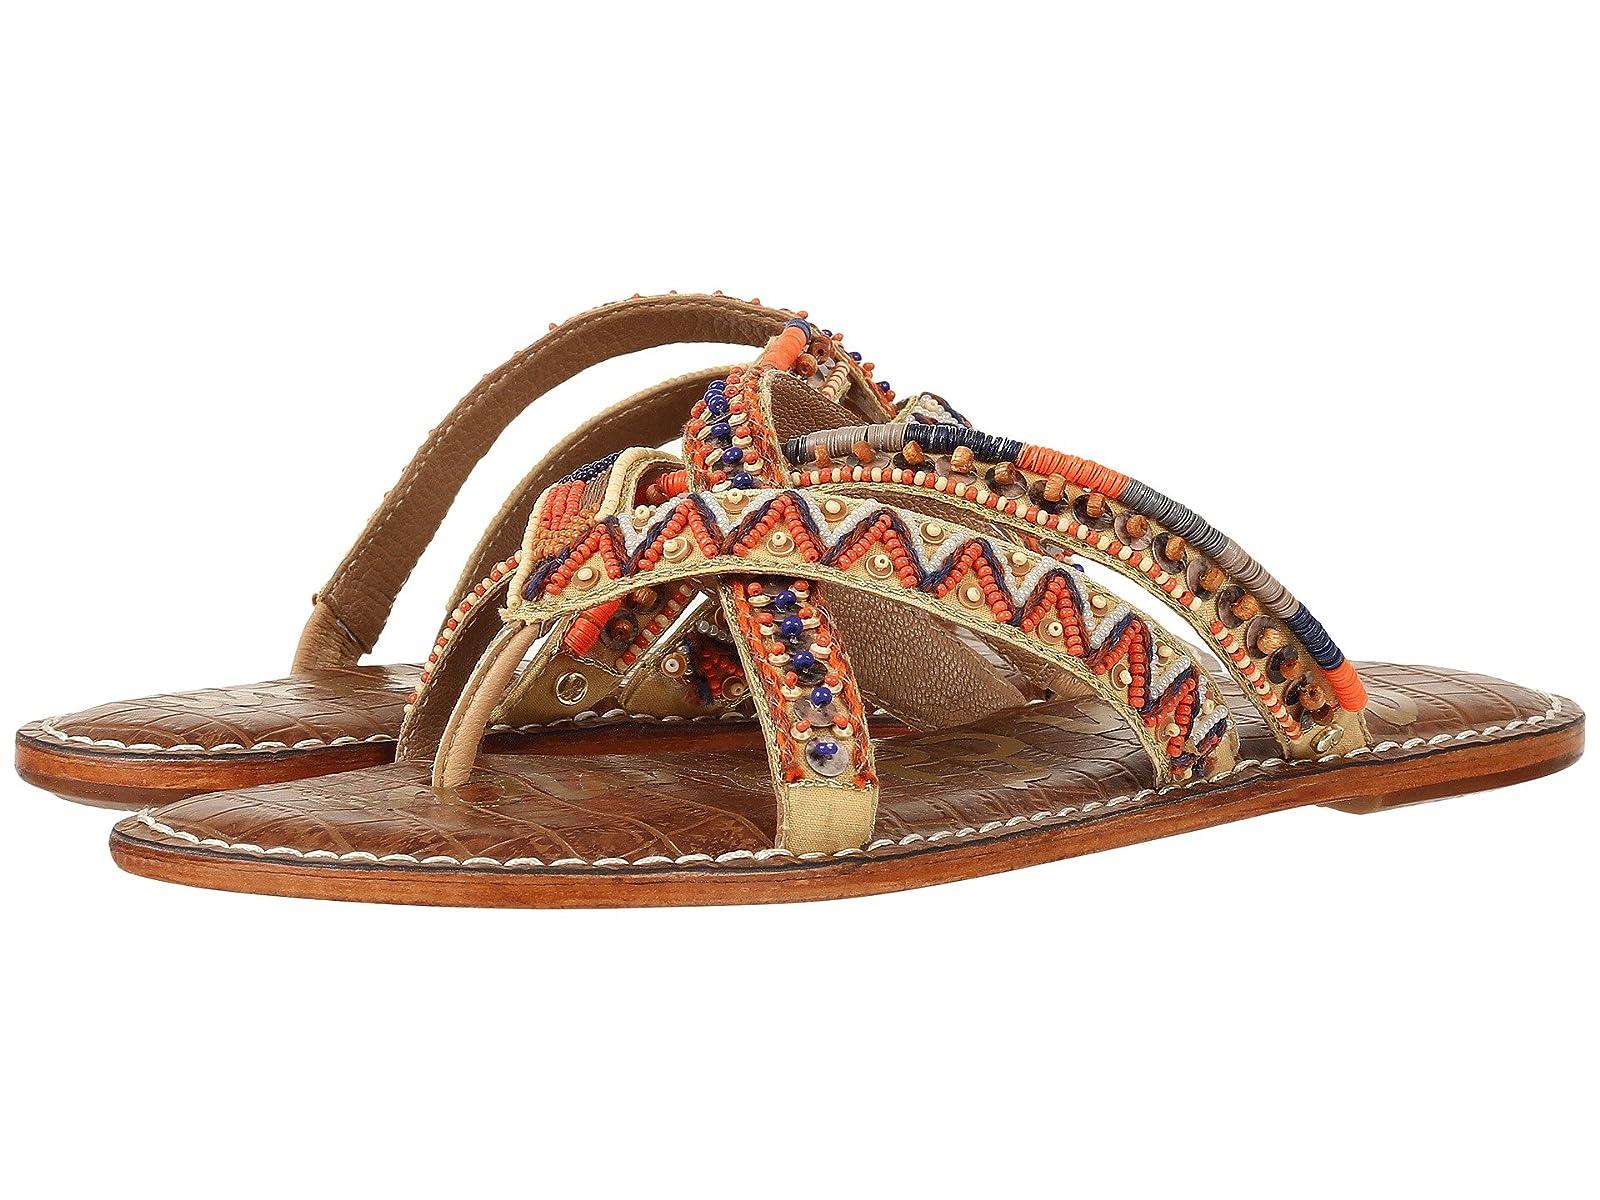 Sam Edelman KarlyCheap and distinctive eye-catching shoes